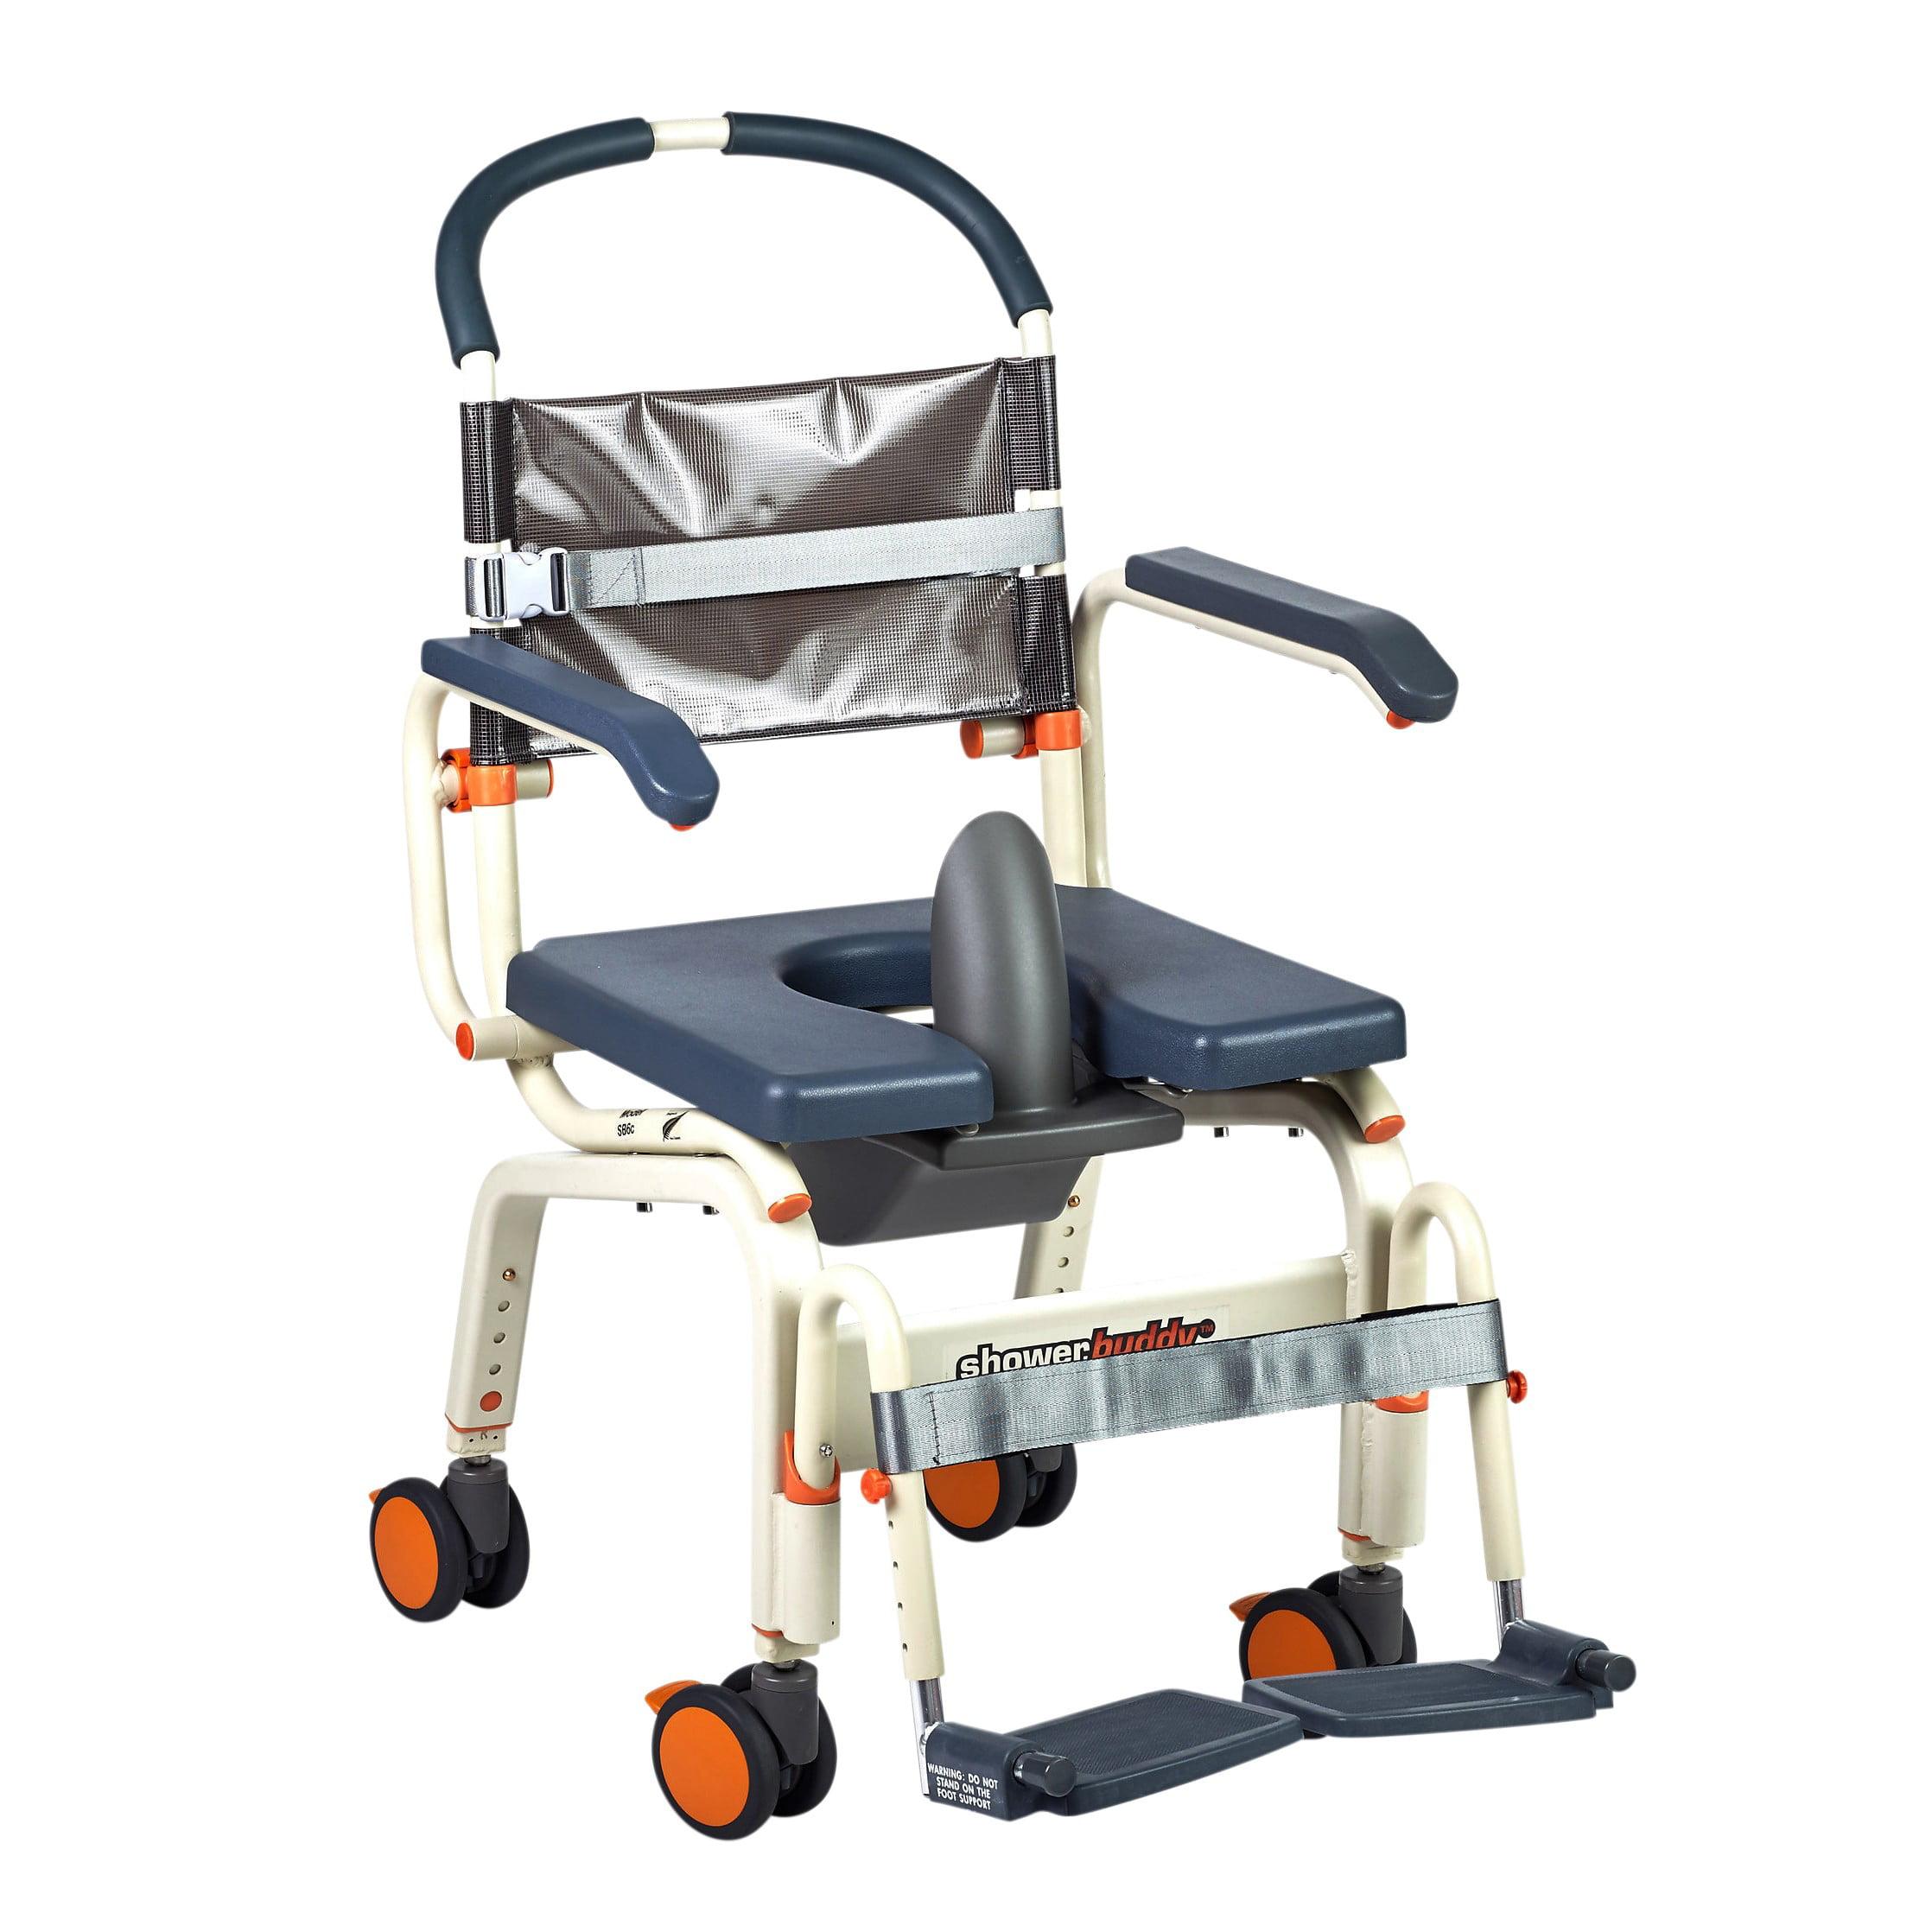 Showerbuddy Roll-In Buddy Lite Shower Commode Chair